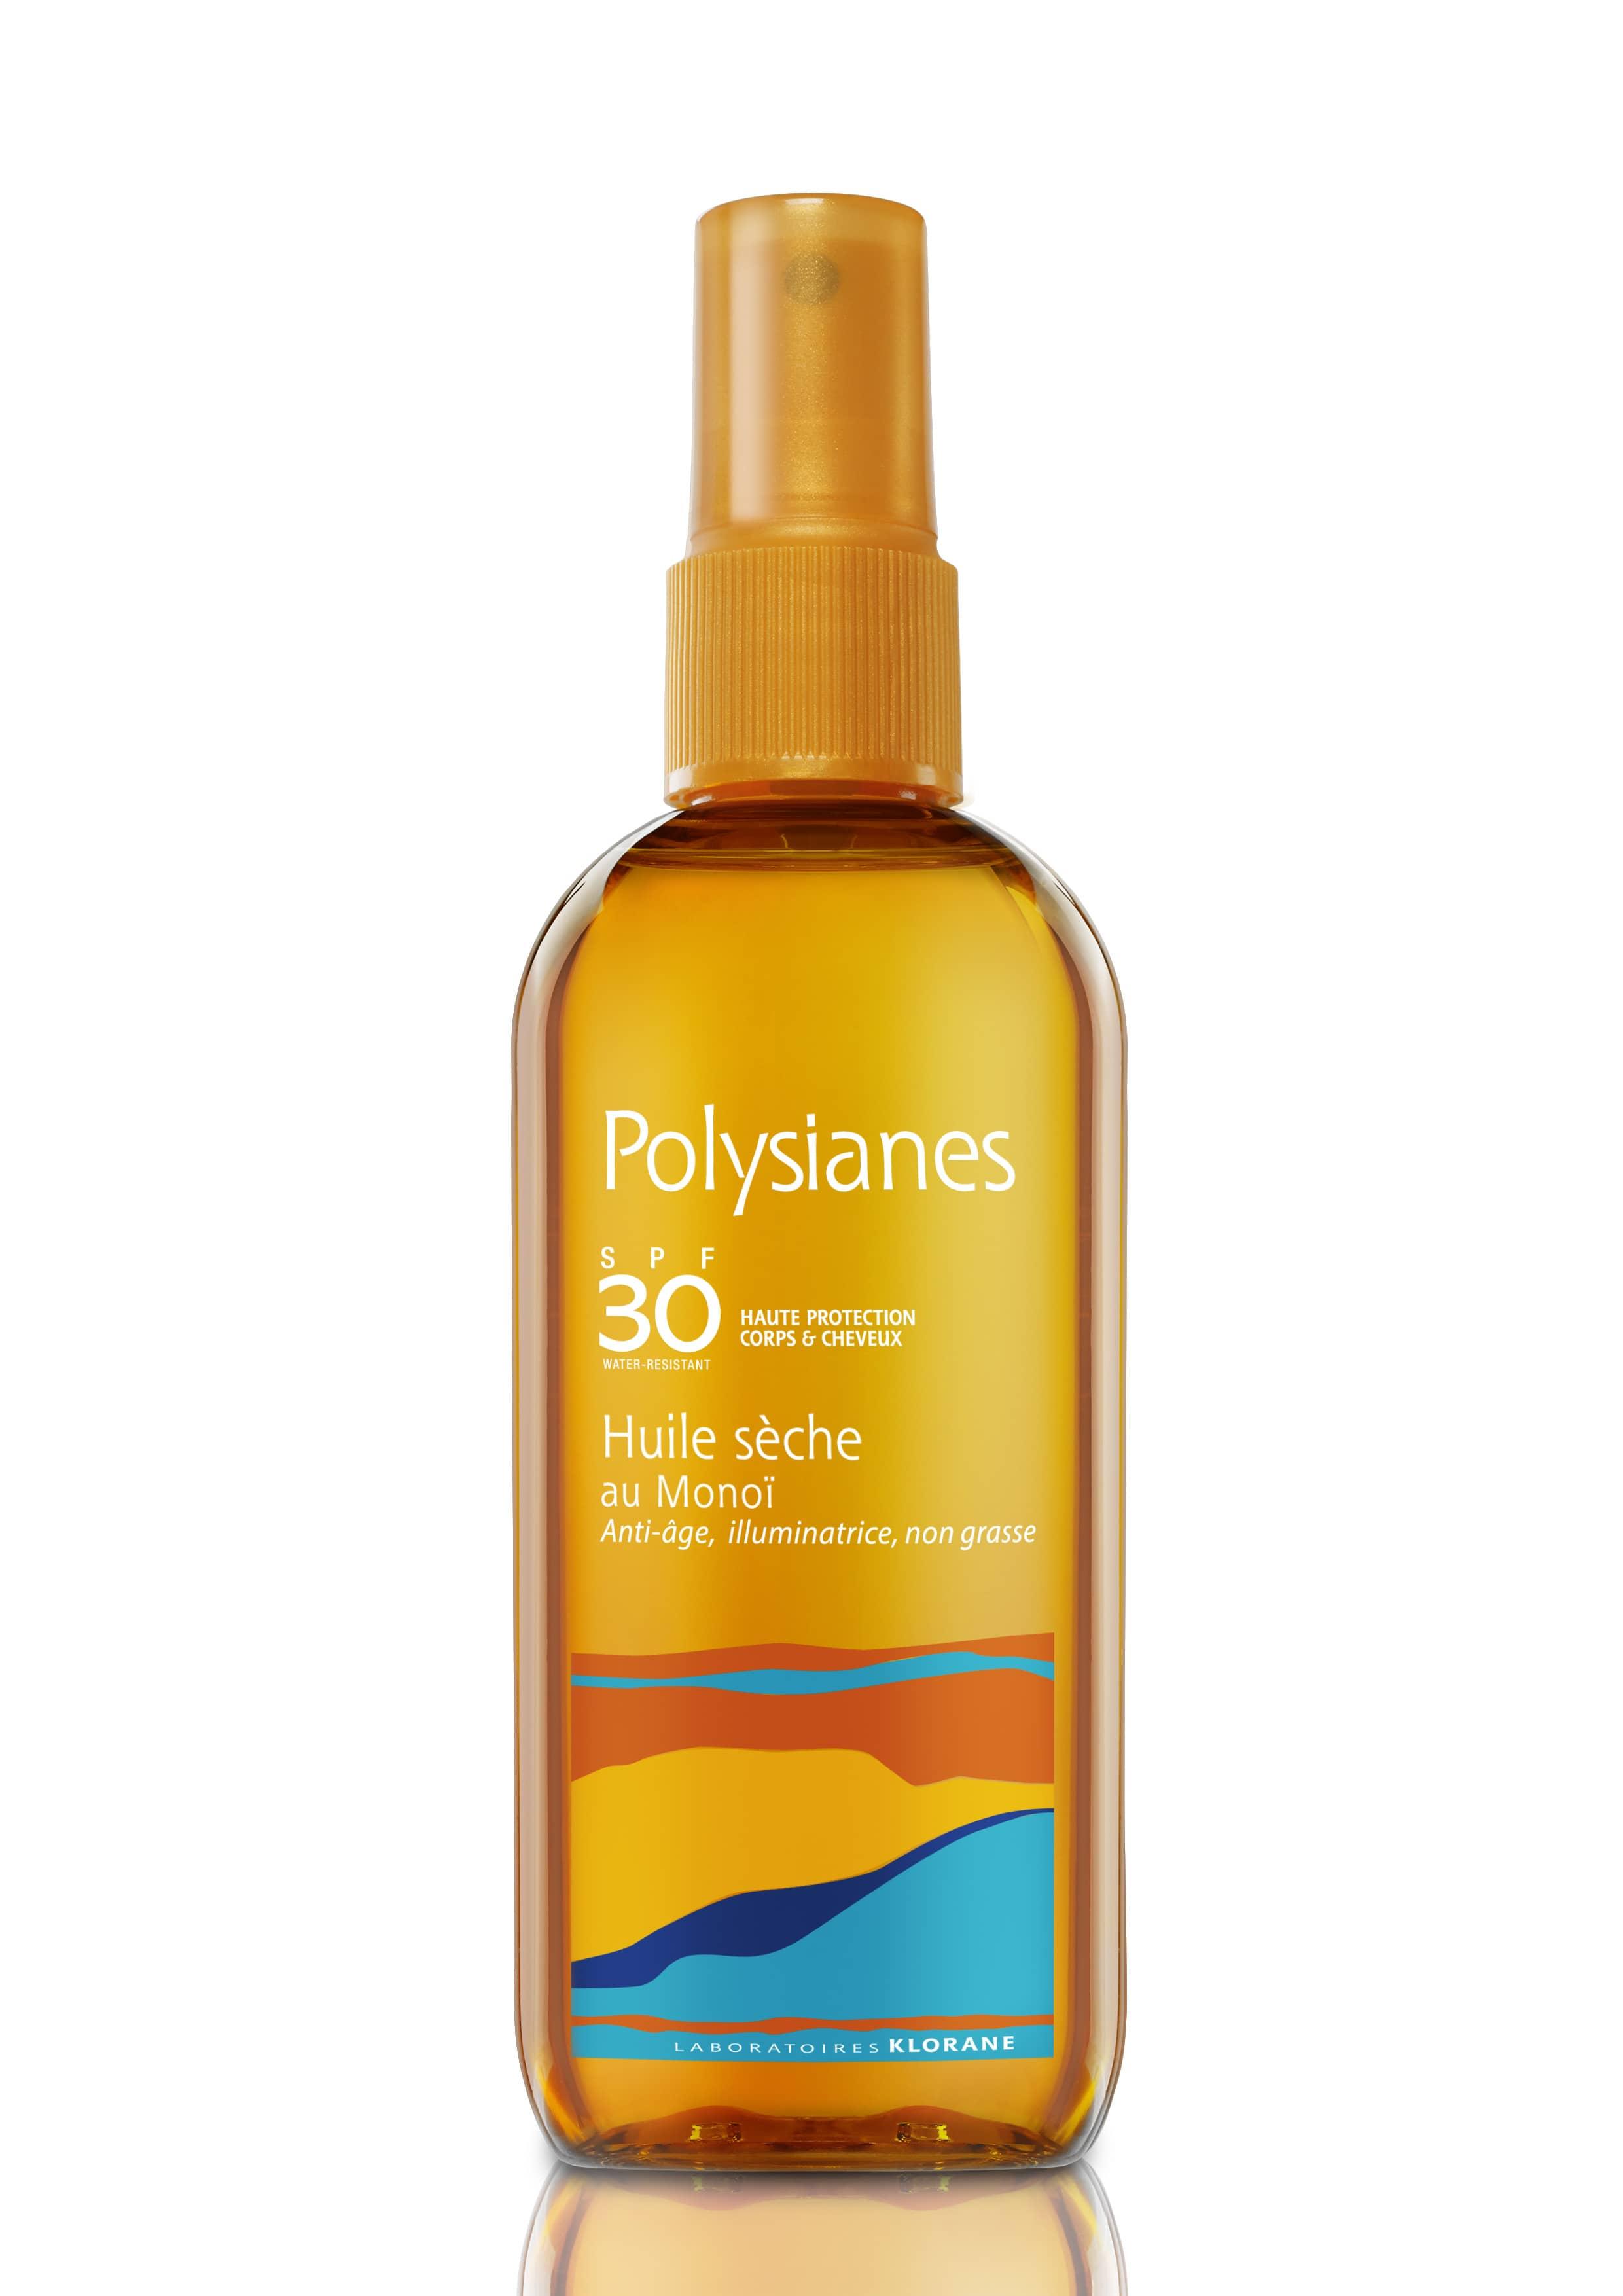 Polysianes Huile Sèche SPF30 Αντιηλιακό Λάδι Προσώπου & Σώματος με εκχύλισμα Monoi, 150ml